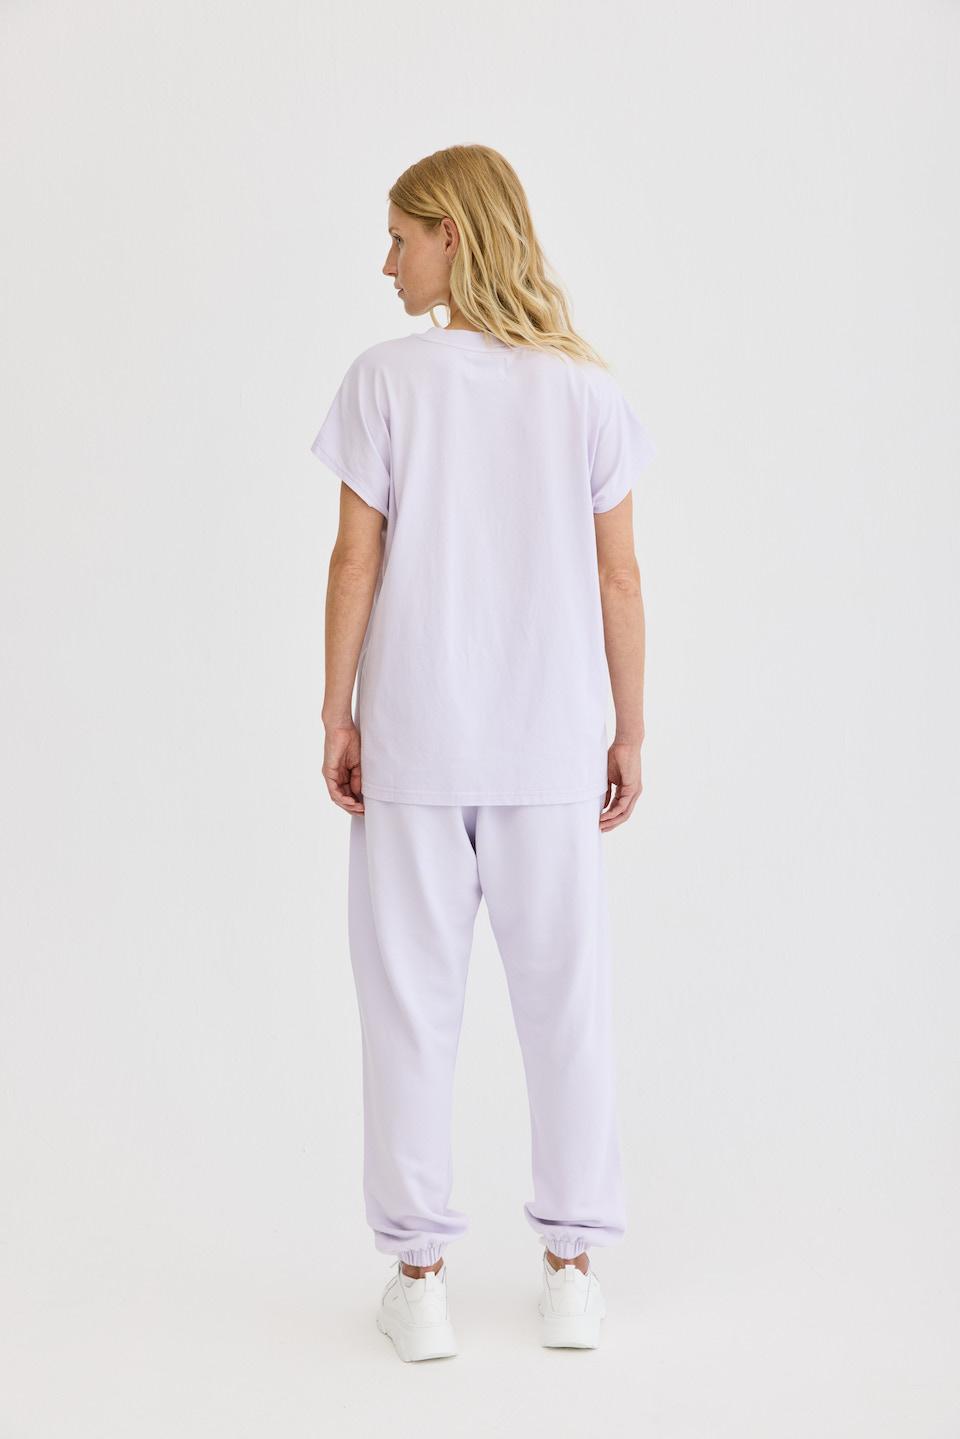 CPH Shirt 5 org. cotton lavender - alternative 1